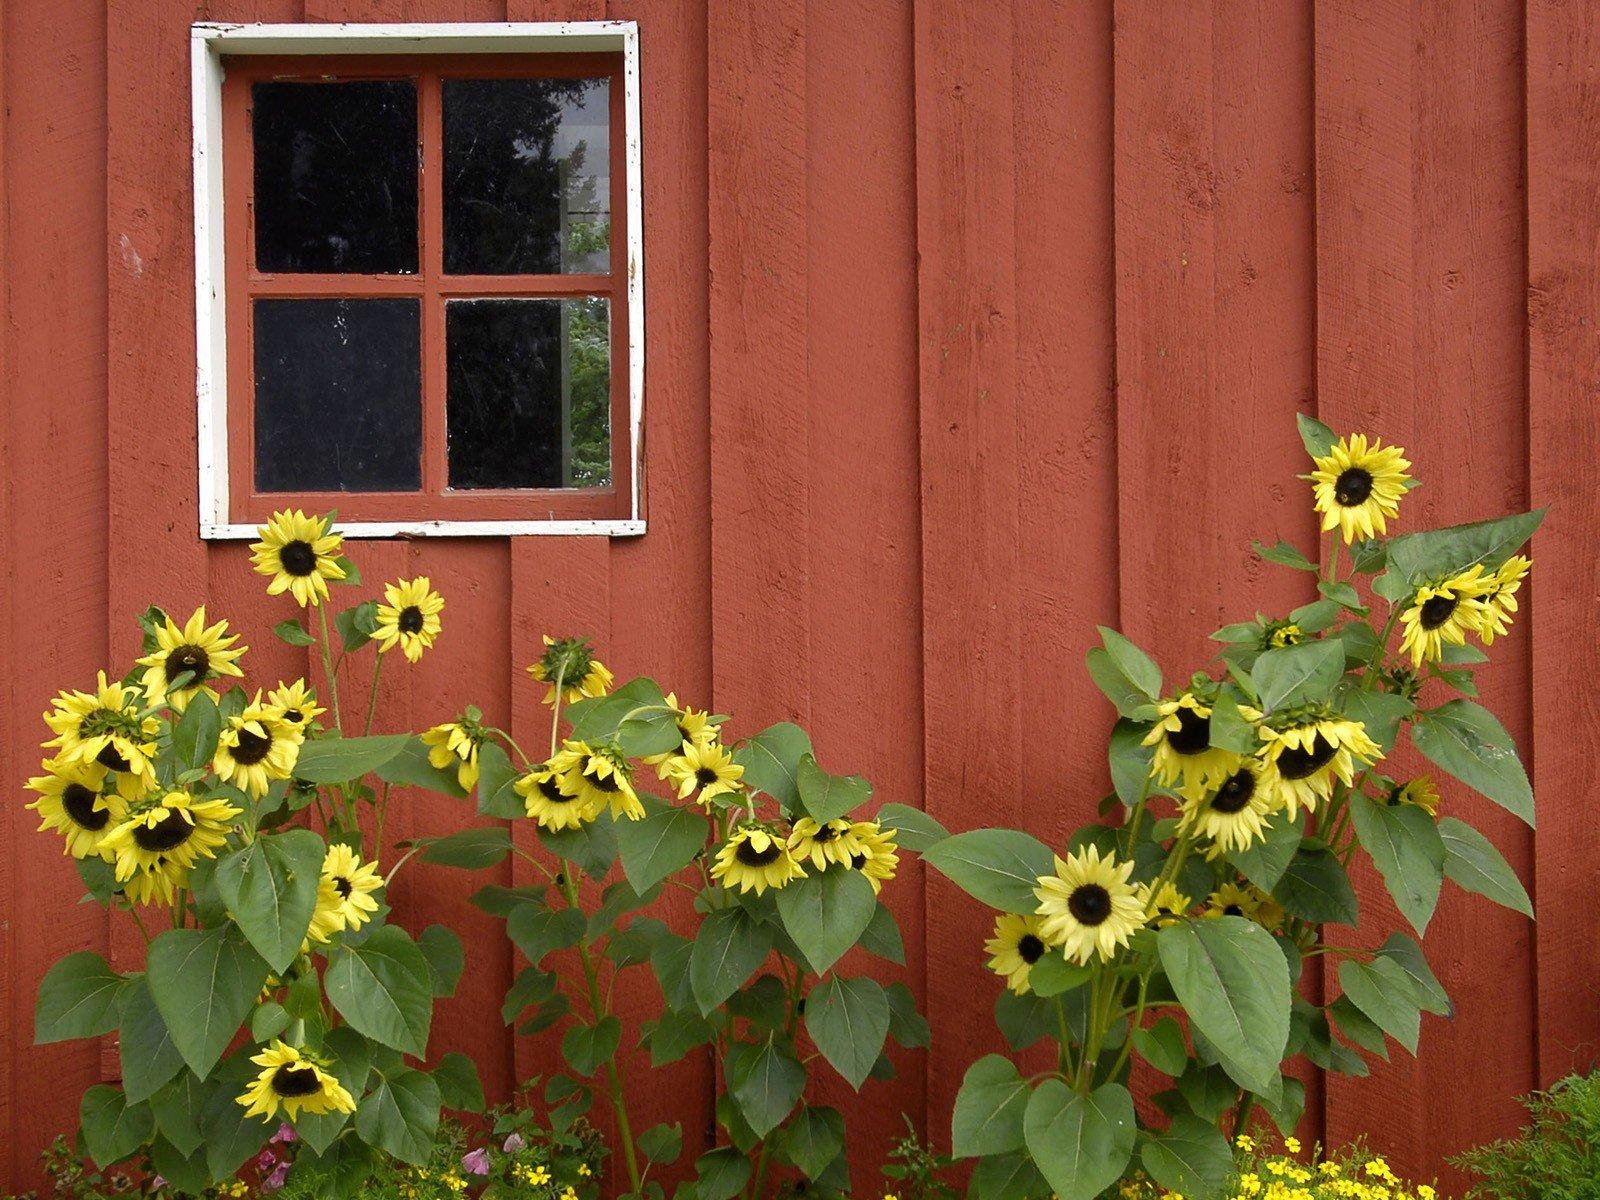 Red Alaska Parks Barn Pioneer Sunflowers Wallpaper Background 1600x1200